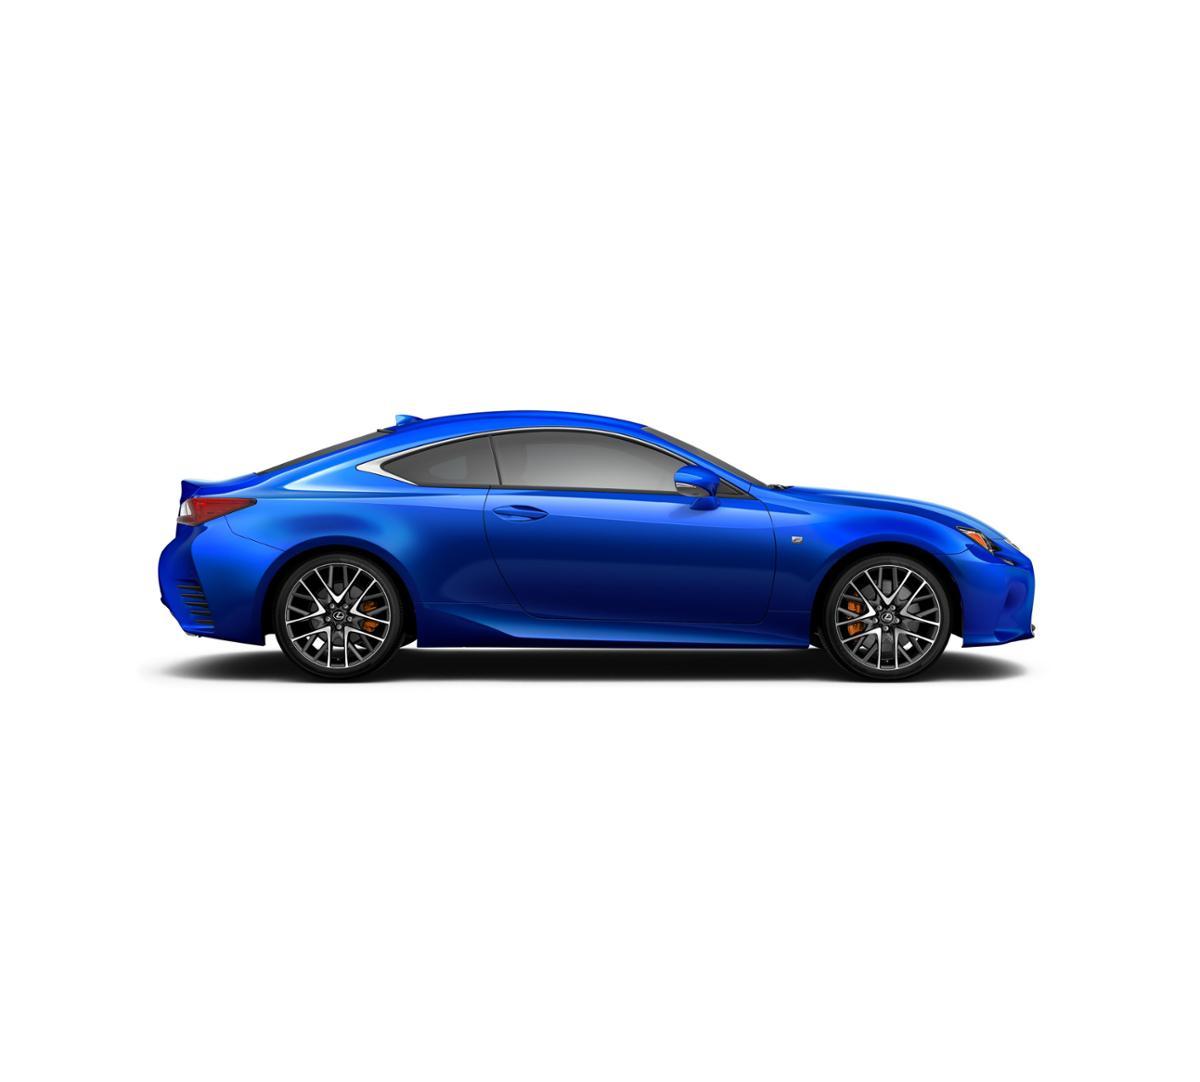 Lexus Rc 350 F Sport Price: Ultrasonic Blue Mica 2017 Lexus RC 350 F SPORT Alexandria